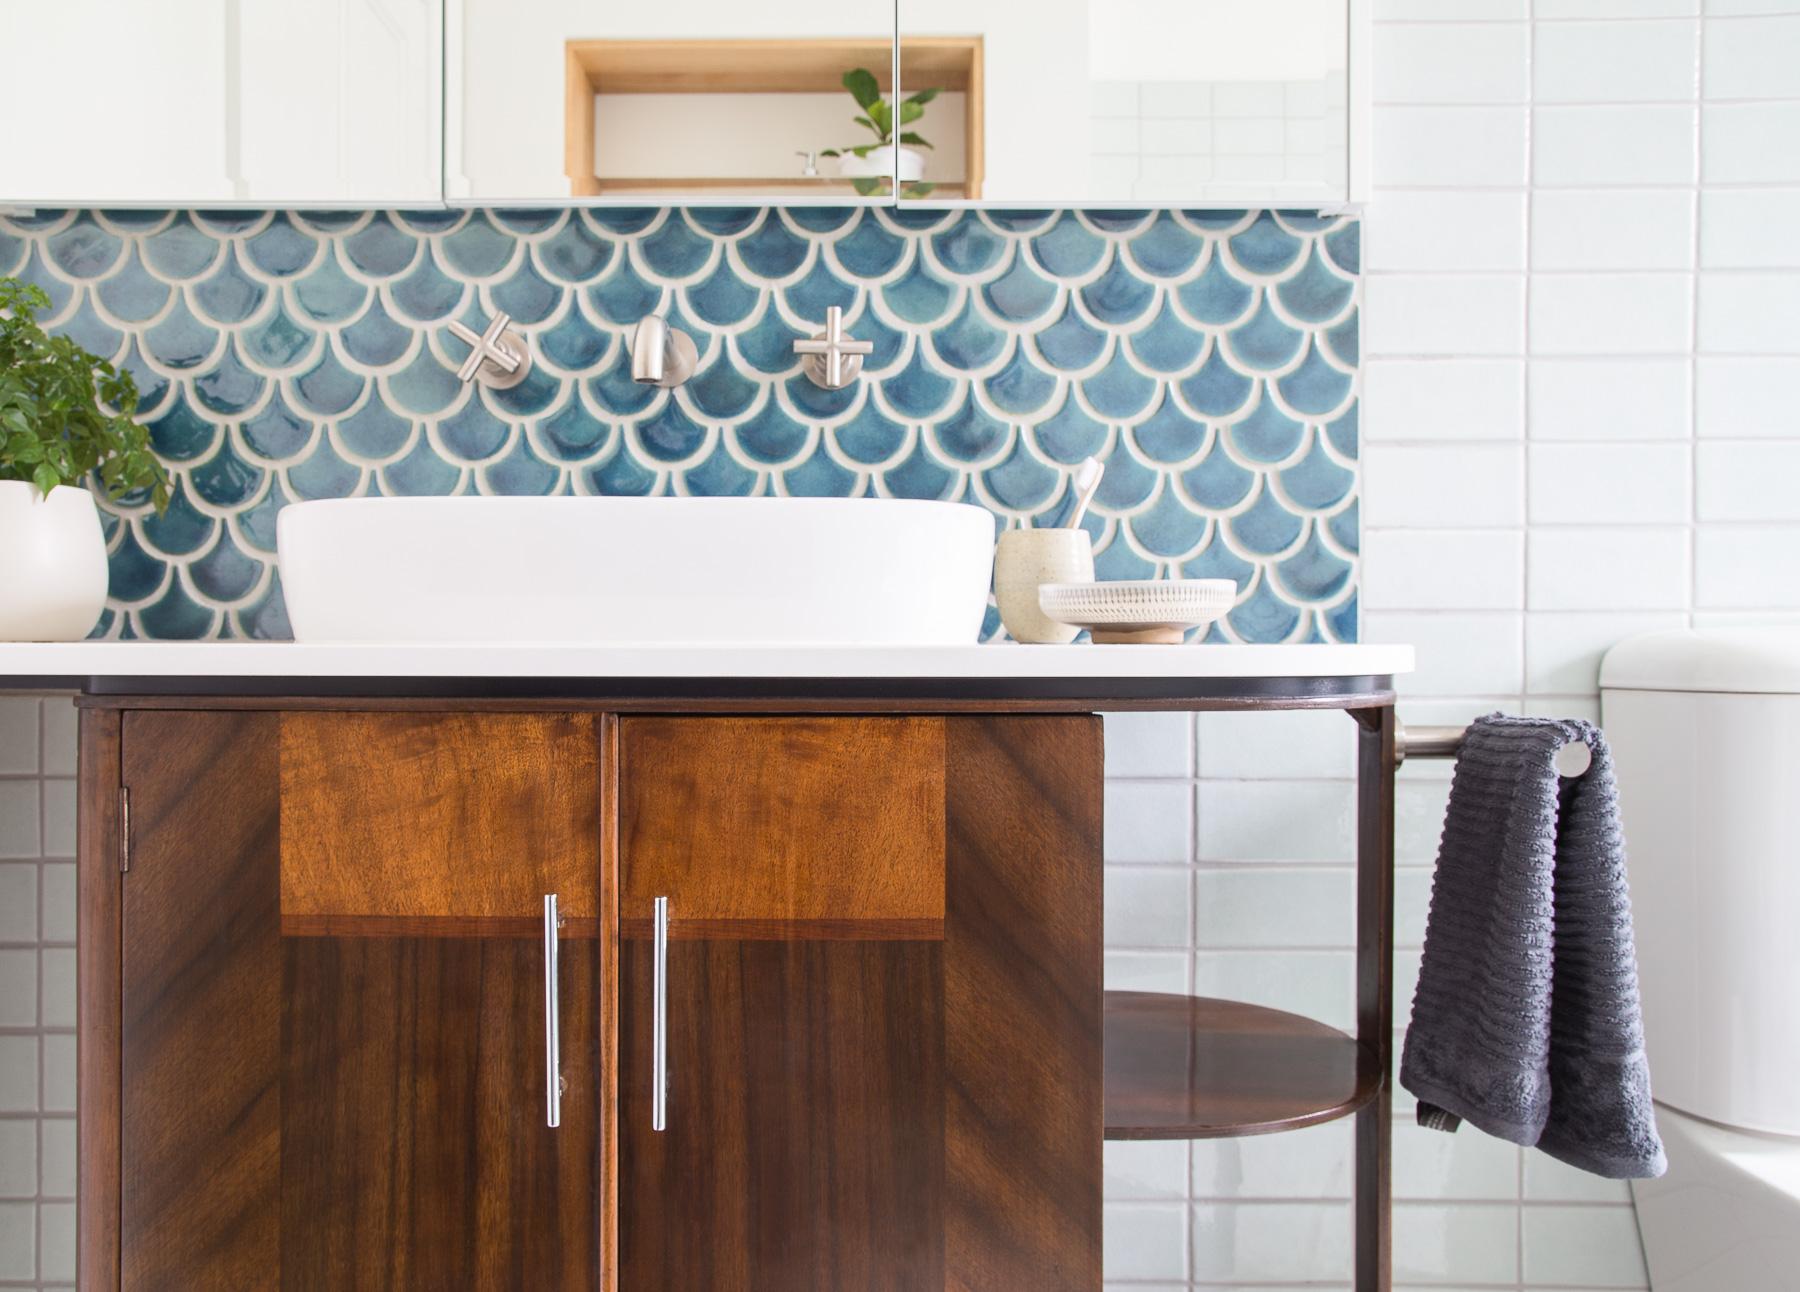 brave+new+eco+sustainable+interior+design (2).jpeg